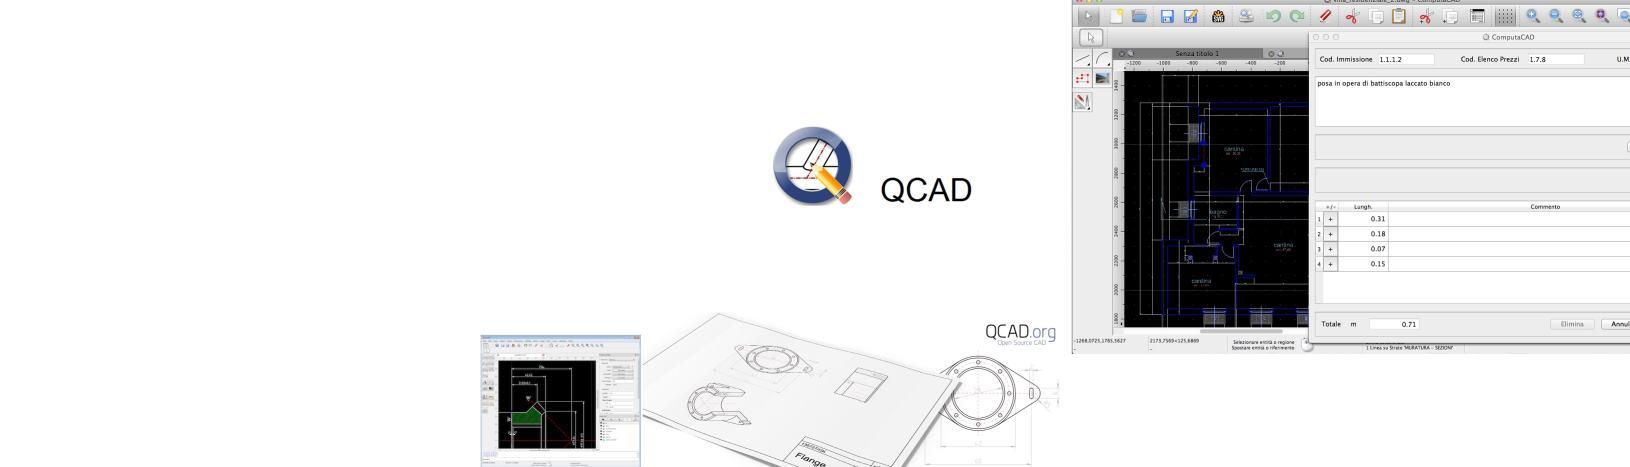 QCAD add-ons